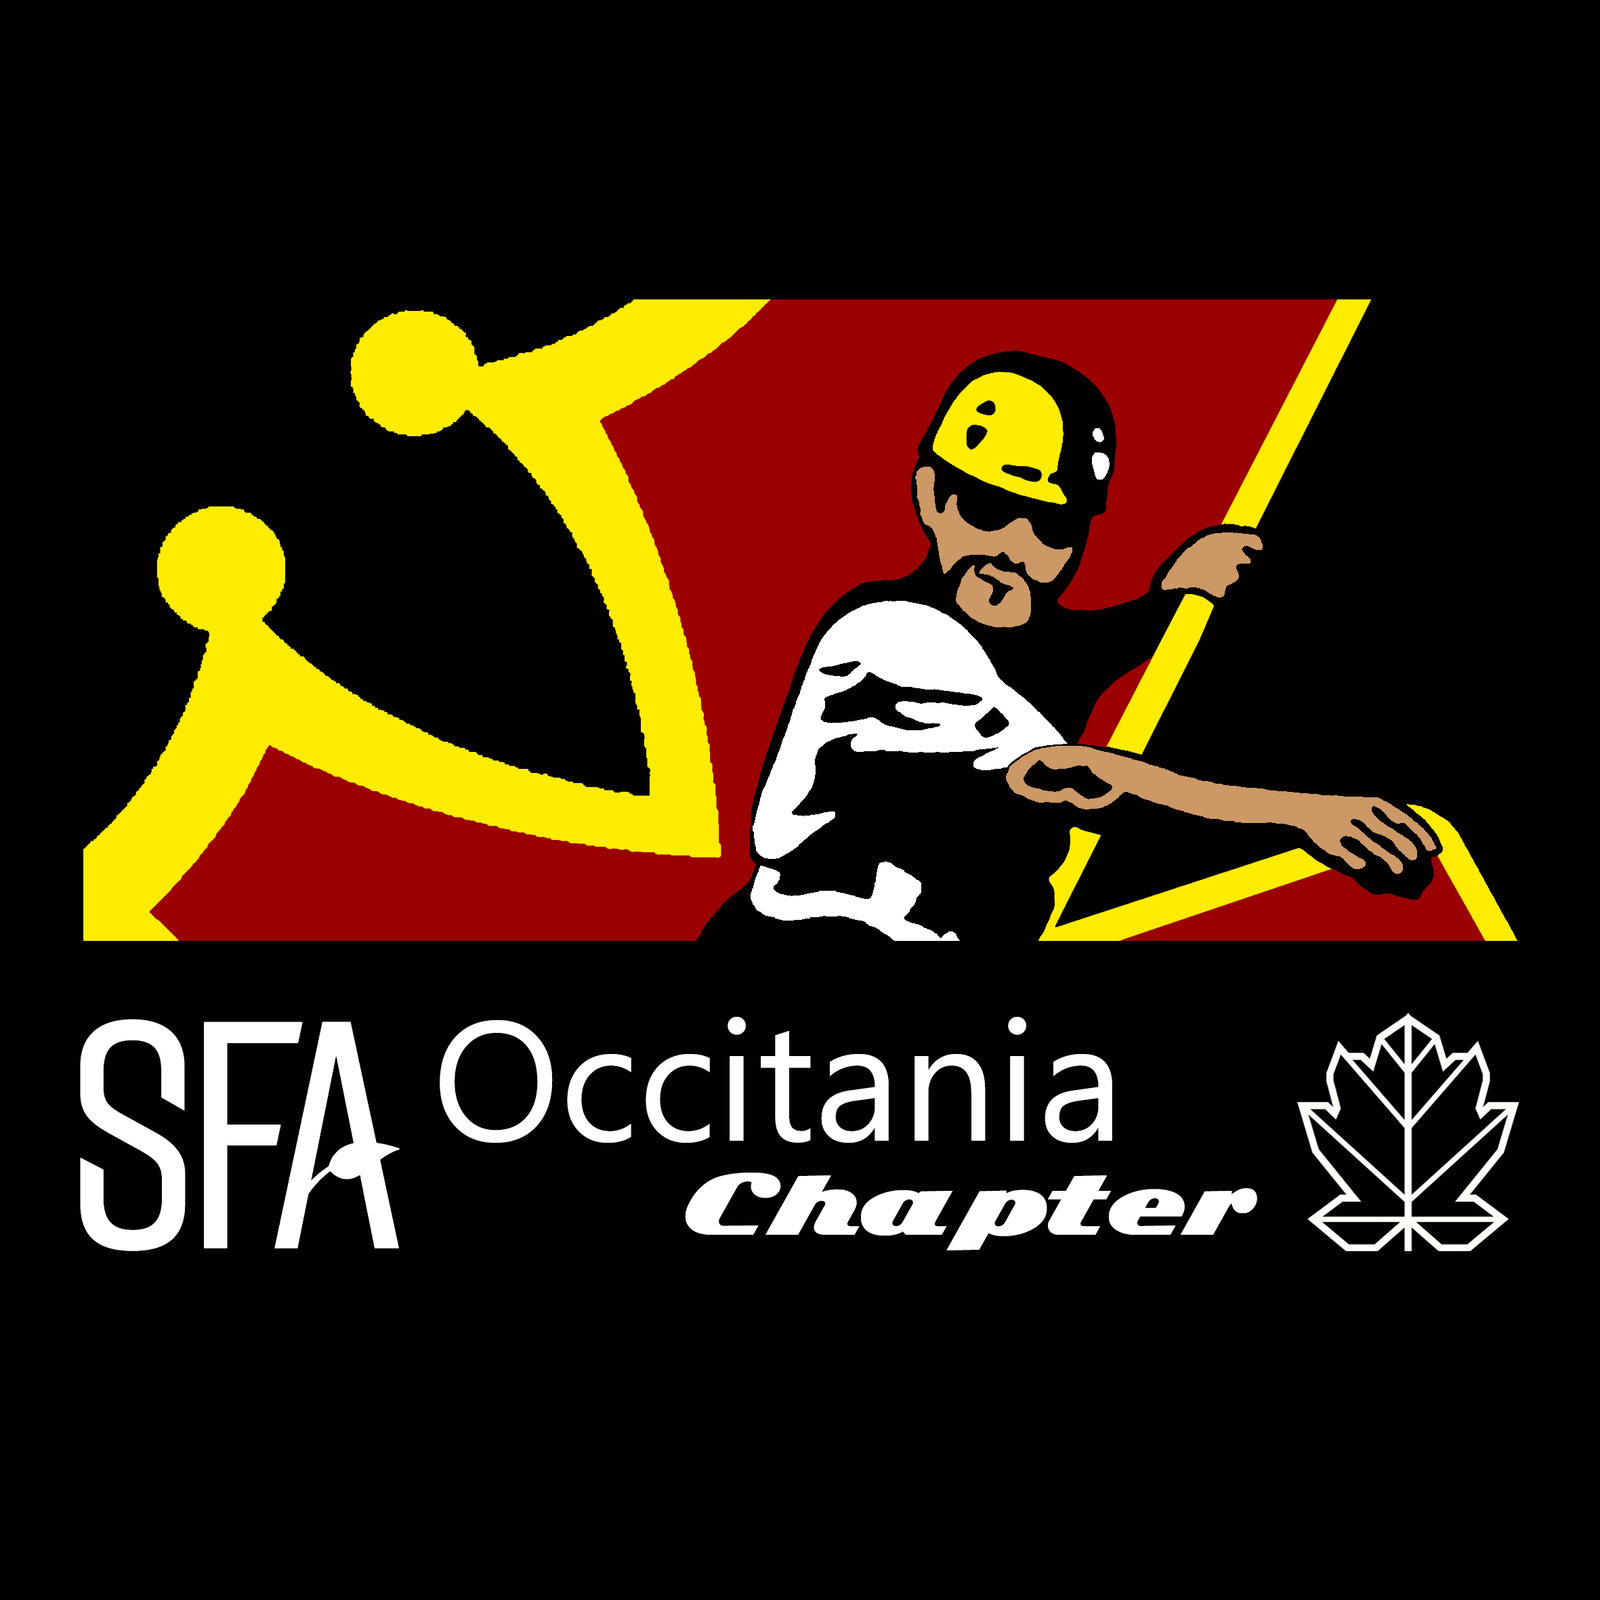 SFA-chapters_occitania